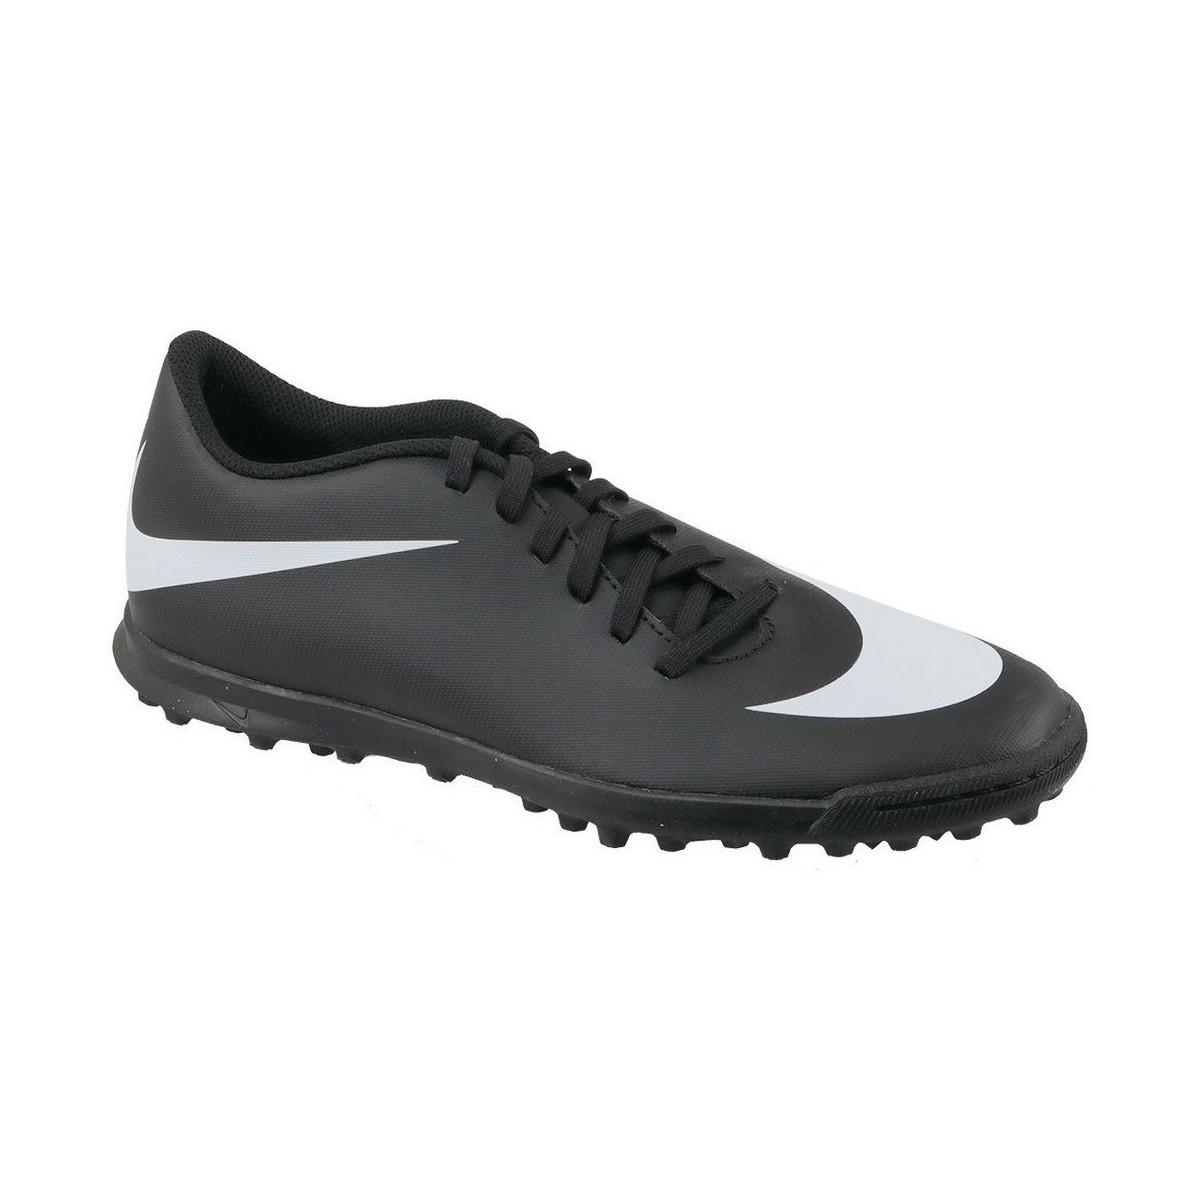 Nike Bravatax Ii Tf Men s Football Boots In Black in Black for Men ... c9e62d2164fd